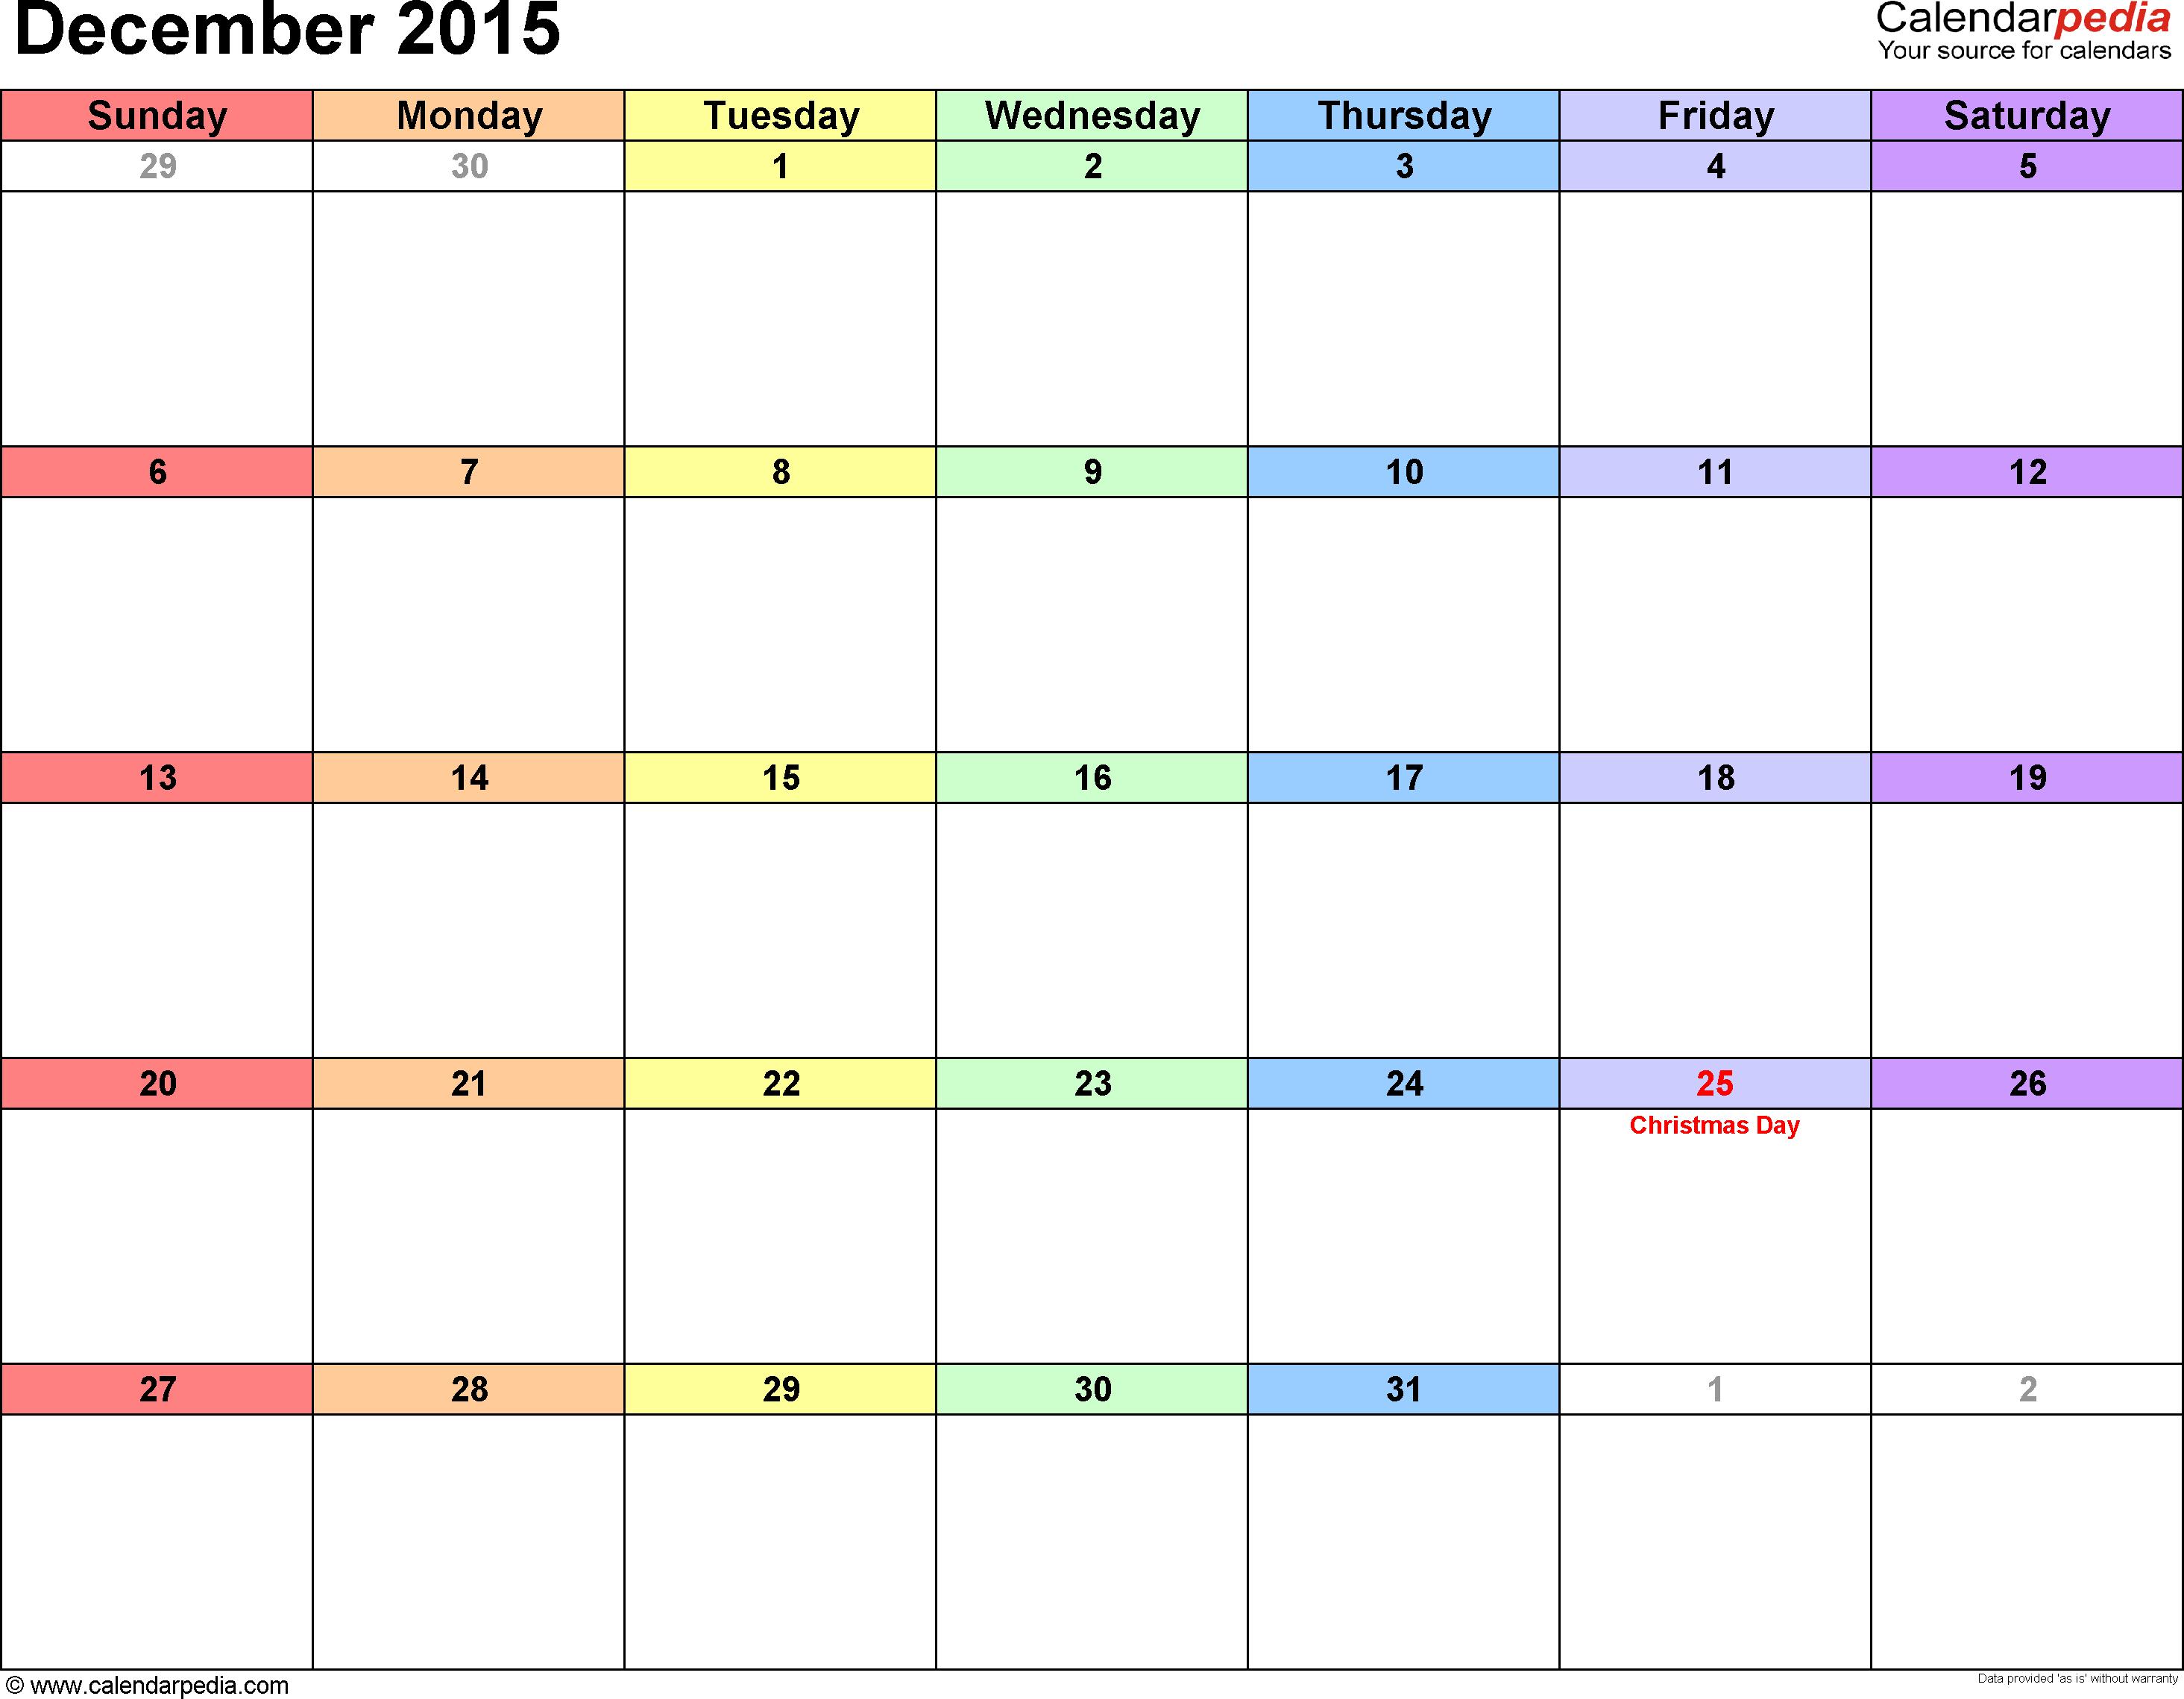 December 2015  Calendar Templates For Word, Excel And Pdf within December 2015 Calendar Printable